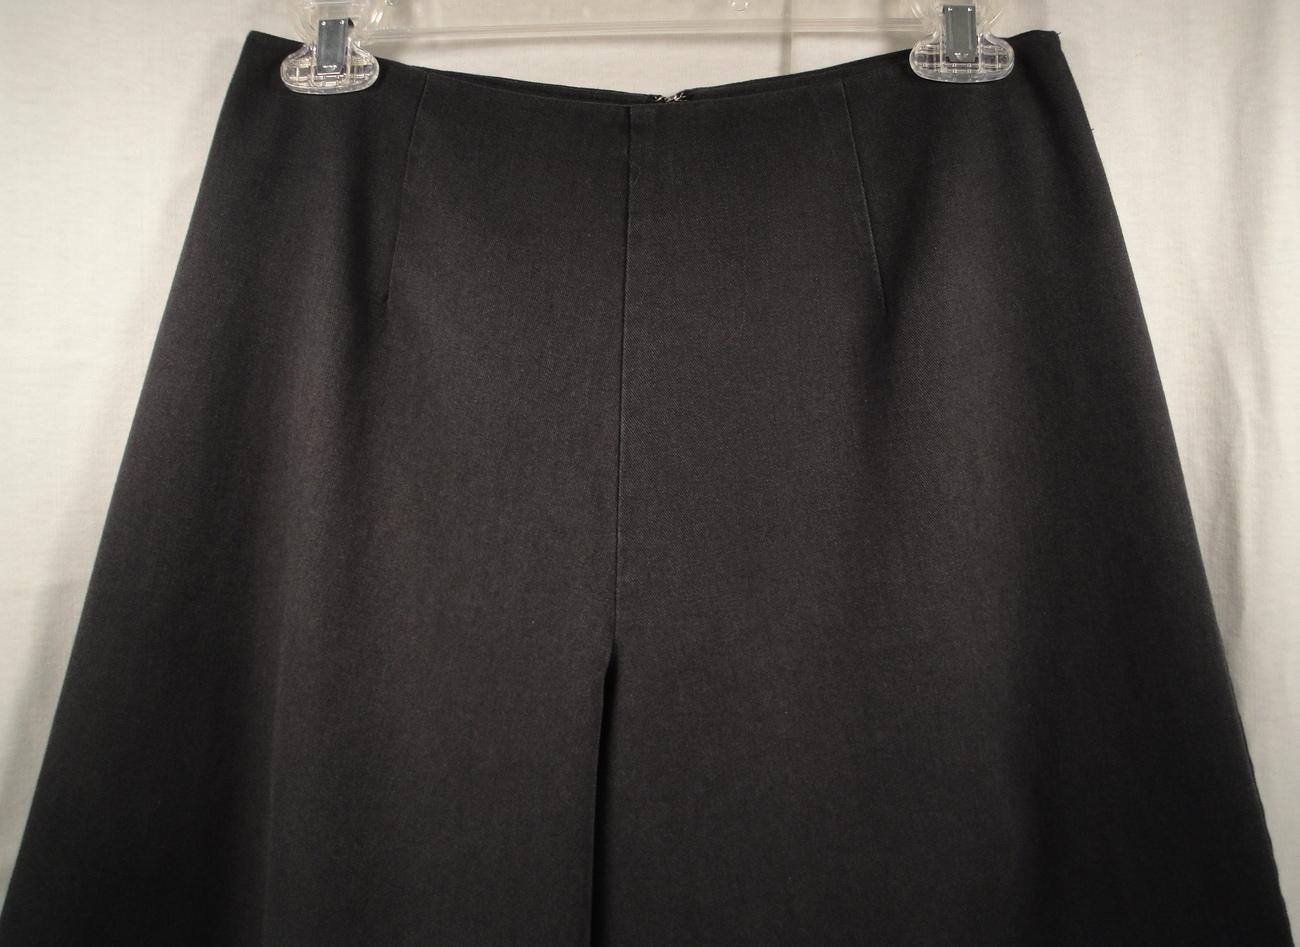 Extra Wide Leg Palazzo Flare Pants Black Handmade Ladies 28 inch waist 27 inseam